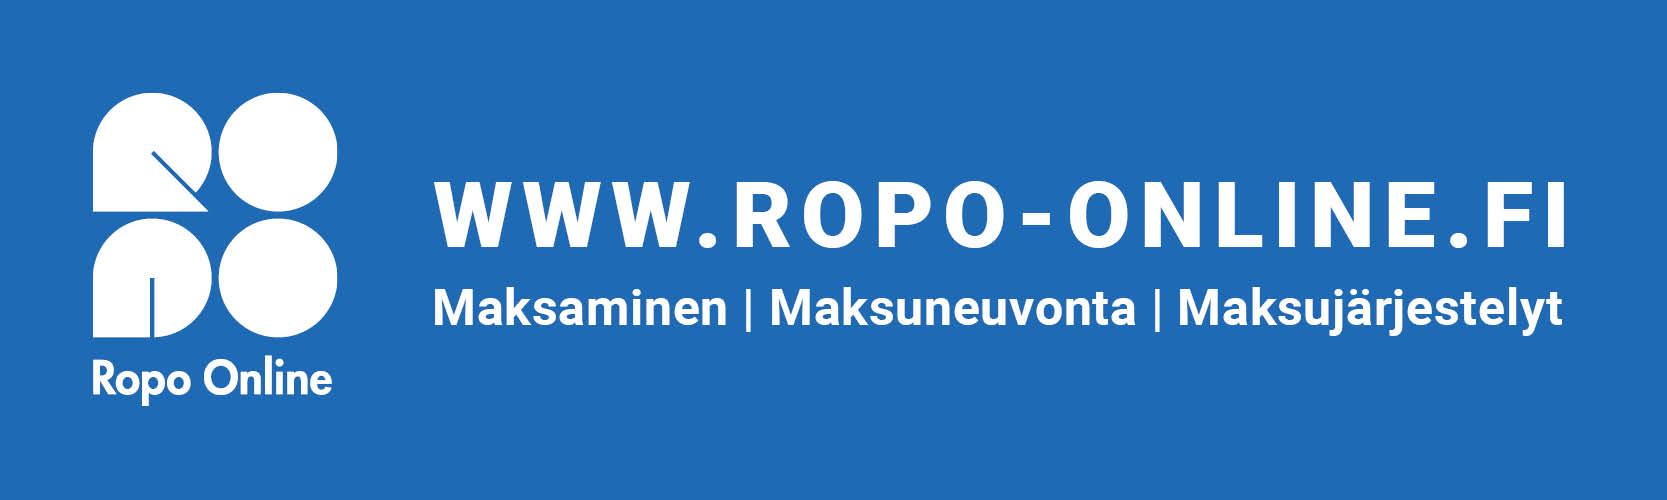 Ropo Capital - Ropo Online 400 x 120 sharp blue